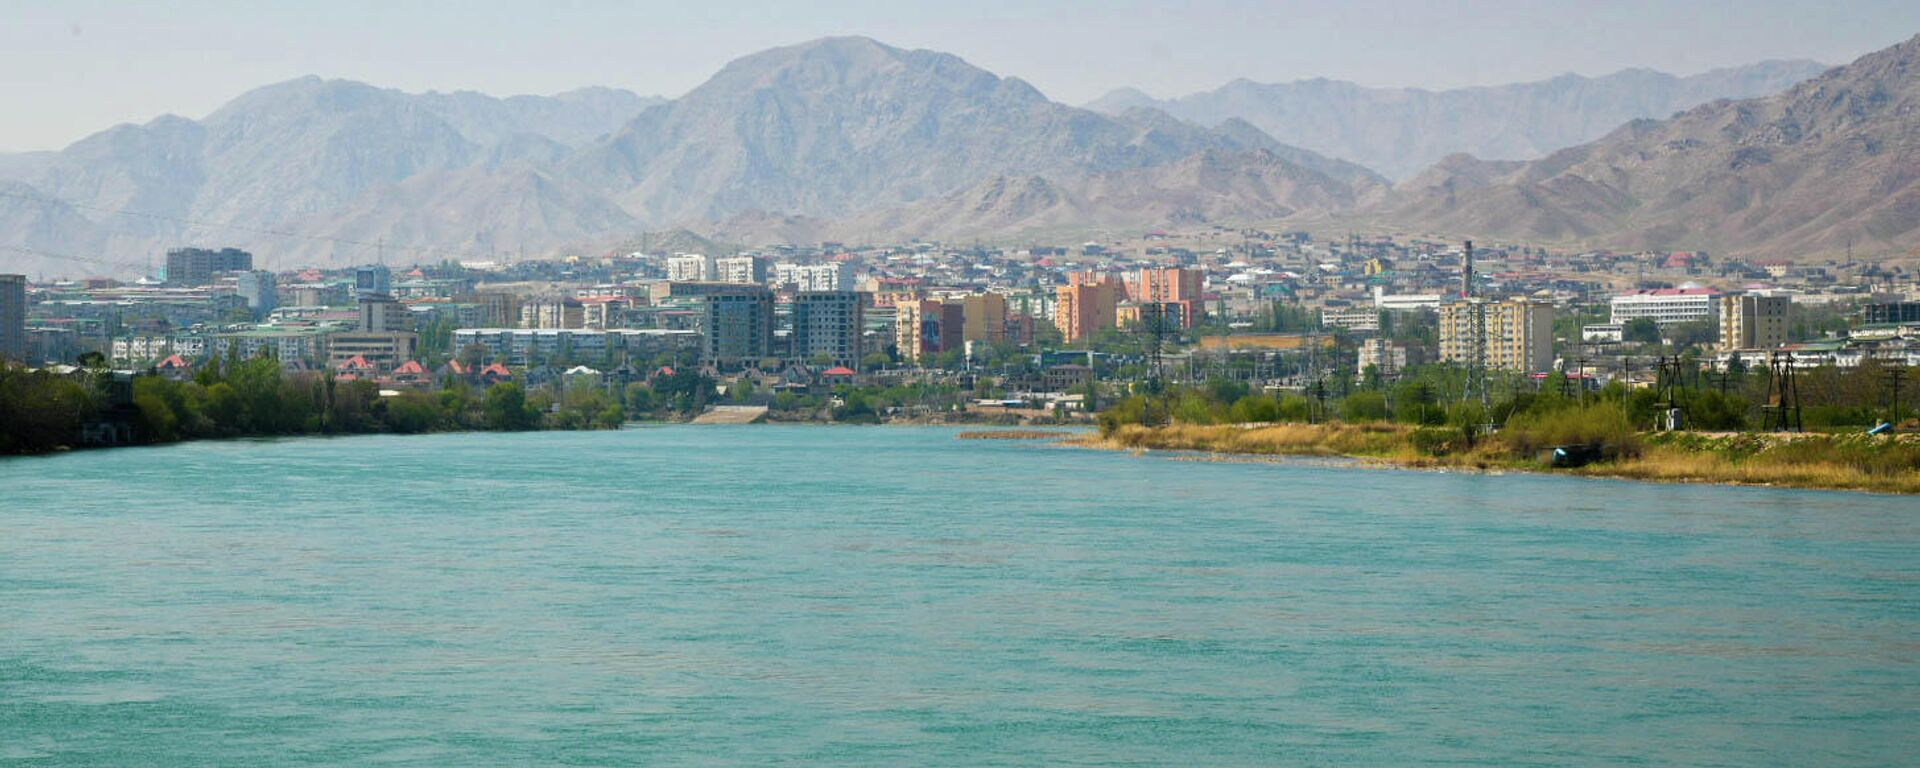 Панорама города Худжанд - Sputnik Таджикистан, 1920, 19.06.2021